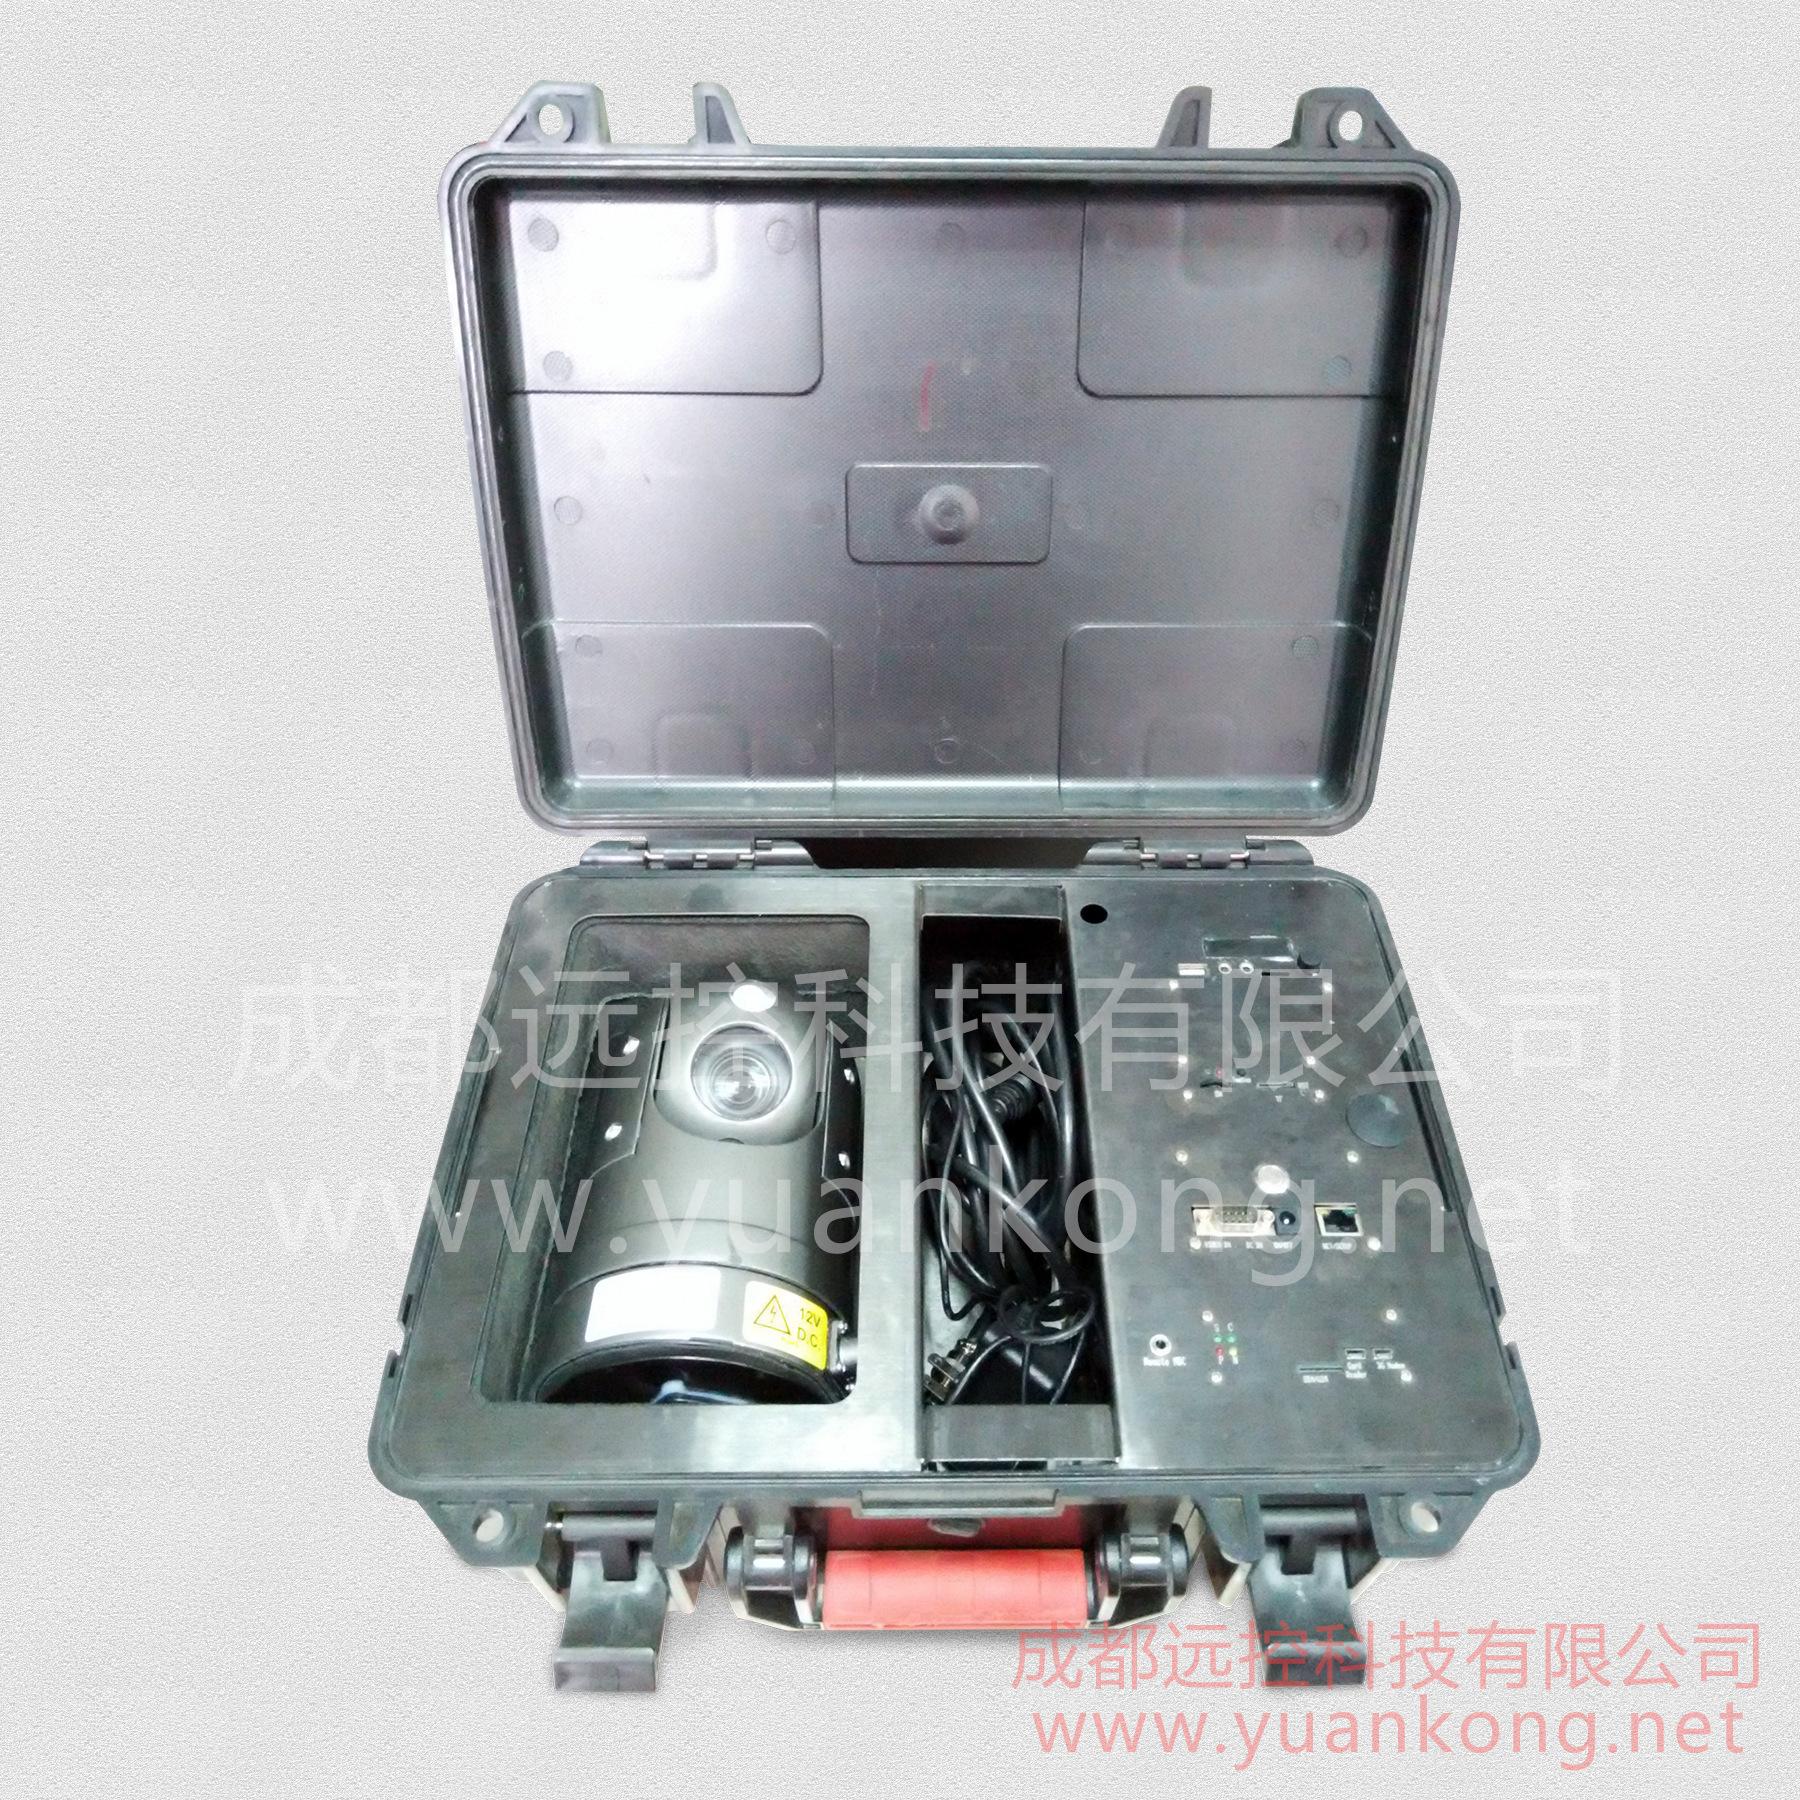 3G电信无线传输 语音对讲 本地存储 三脚架式快速布控指挥系统